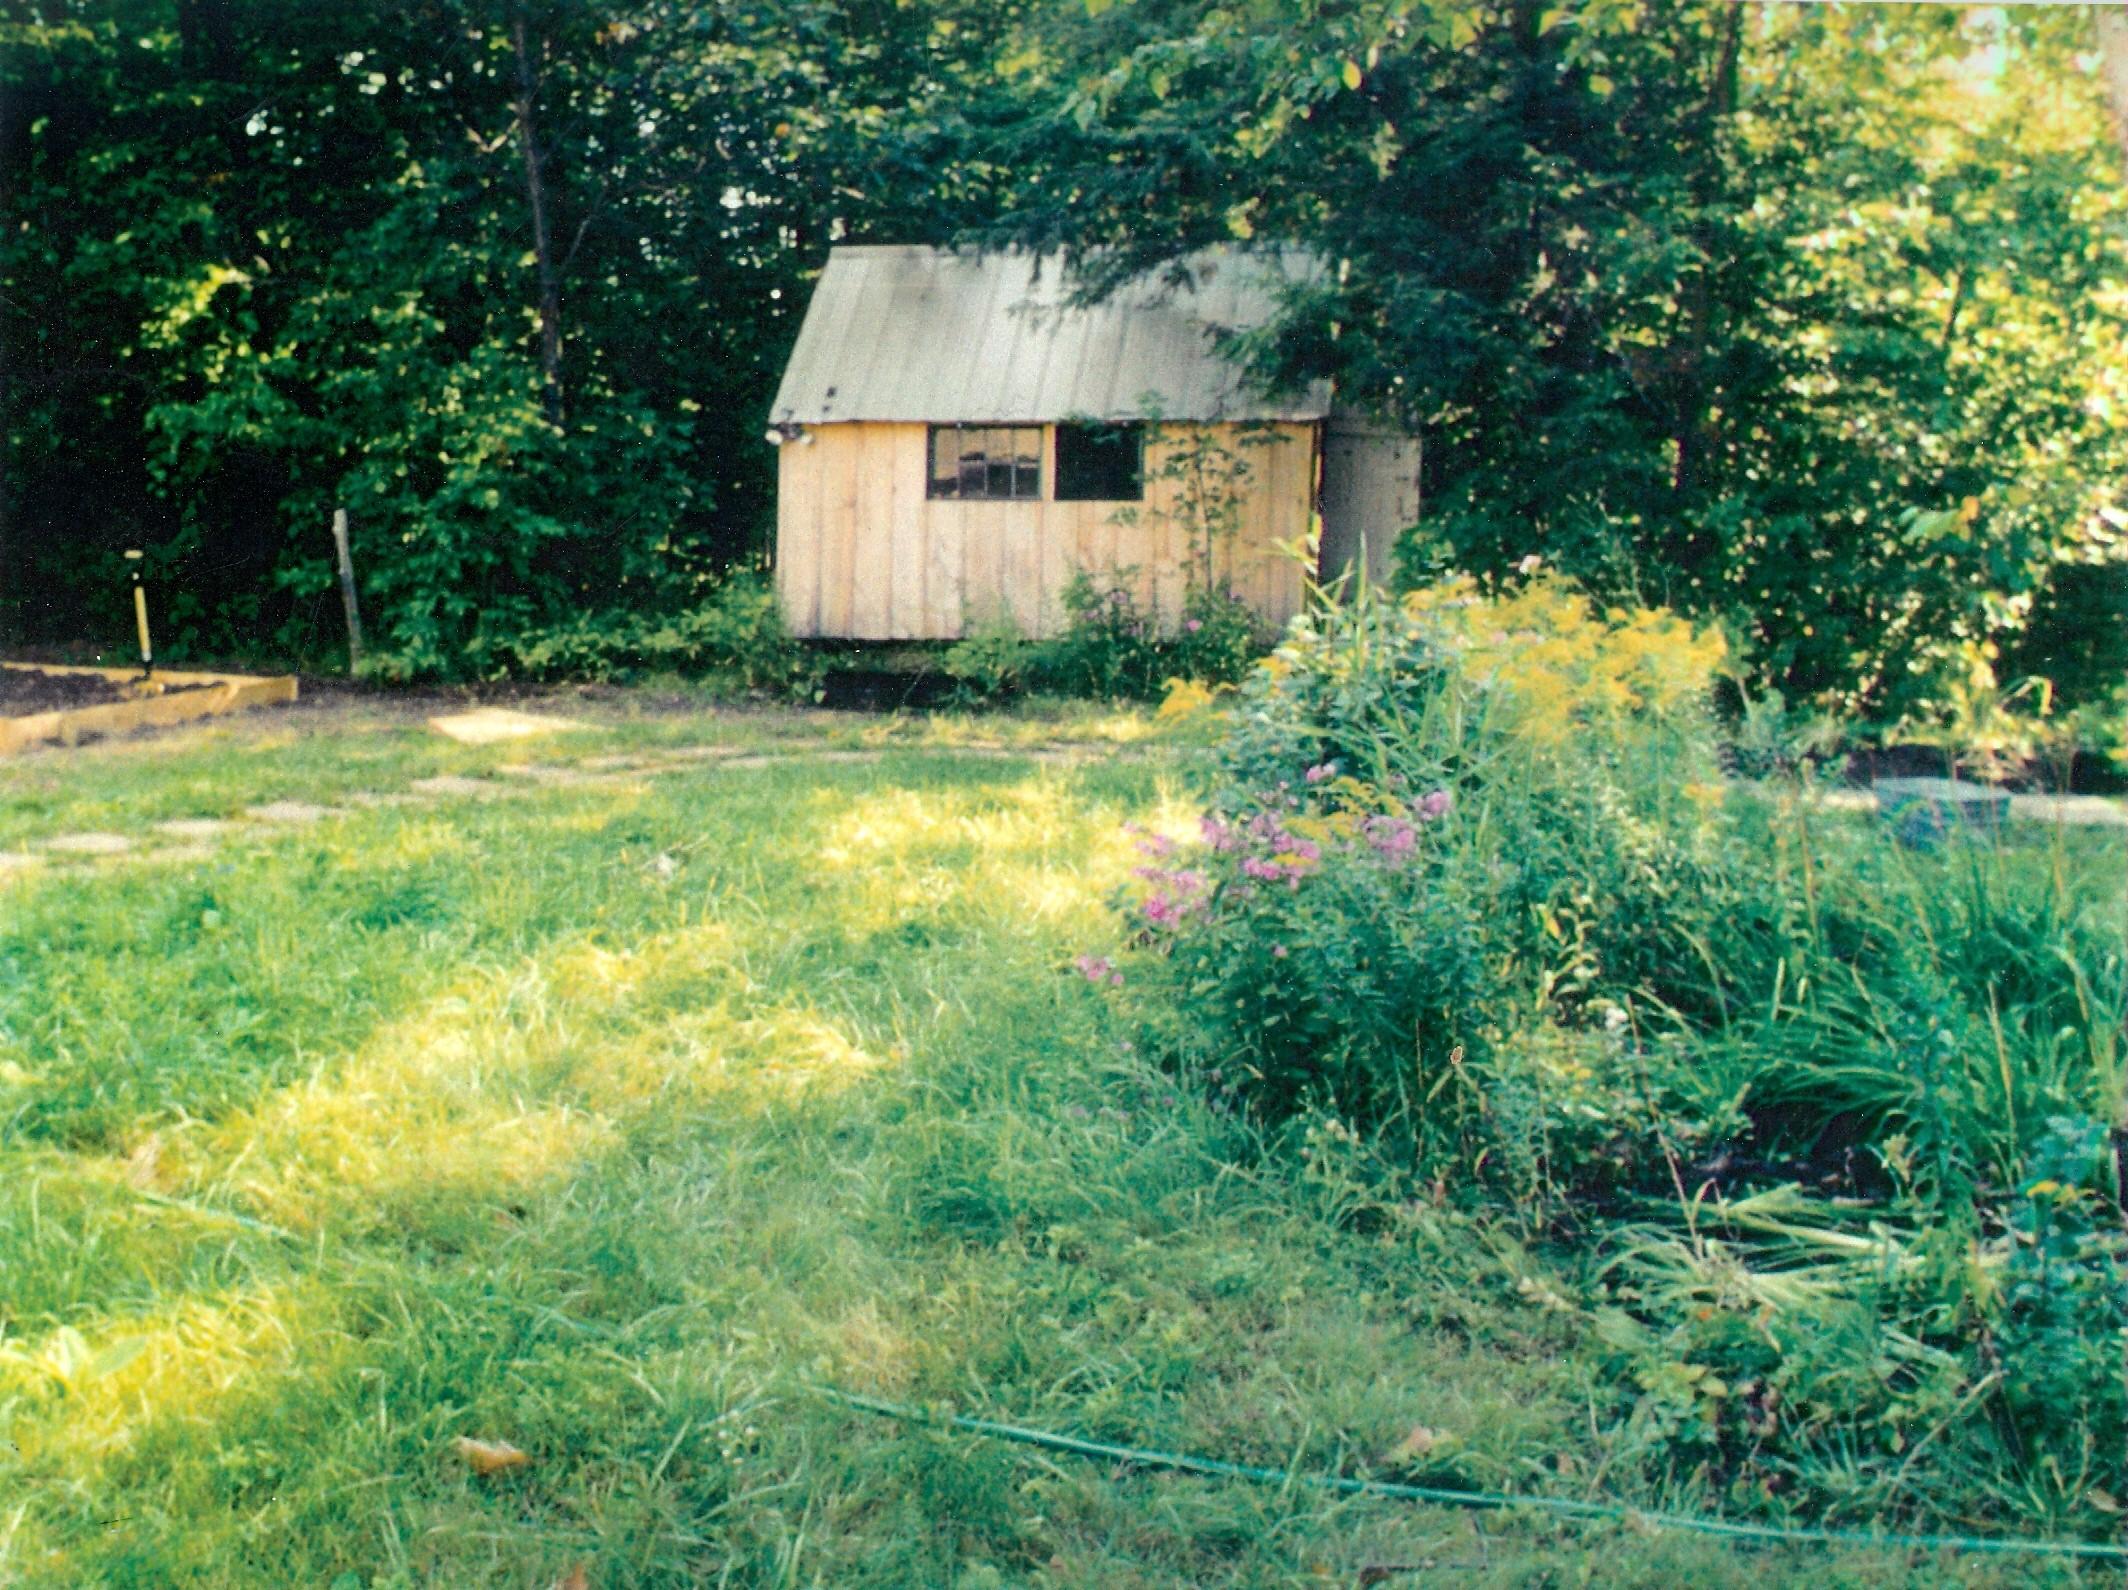 Parker sleeping cabin, possibly oldest building on lake (2)